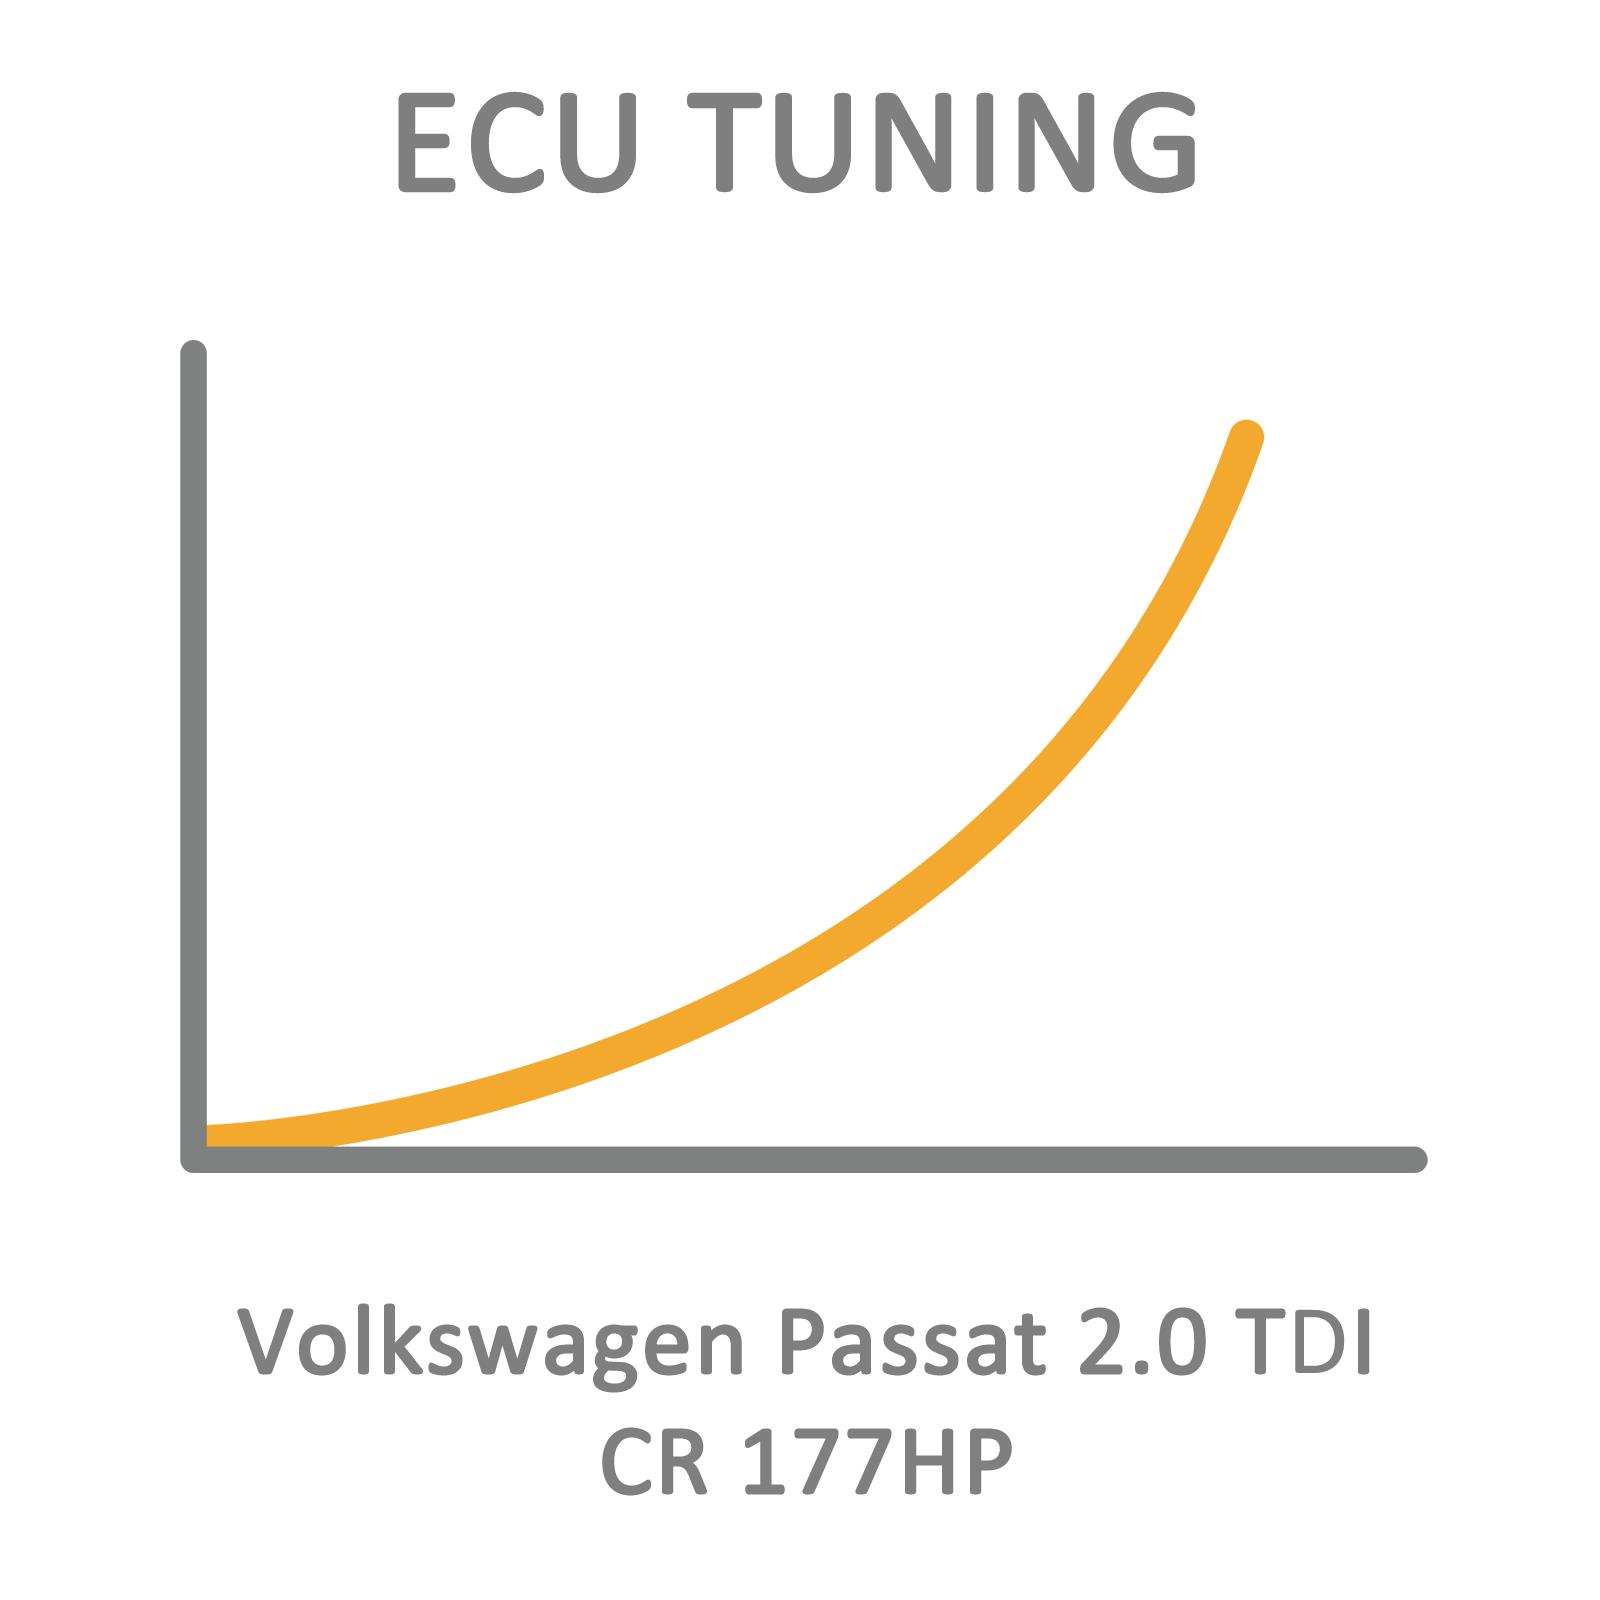 Volkswagen Passat 2.0 TDI CR 177HP ECU Tuning Remapping